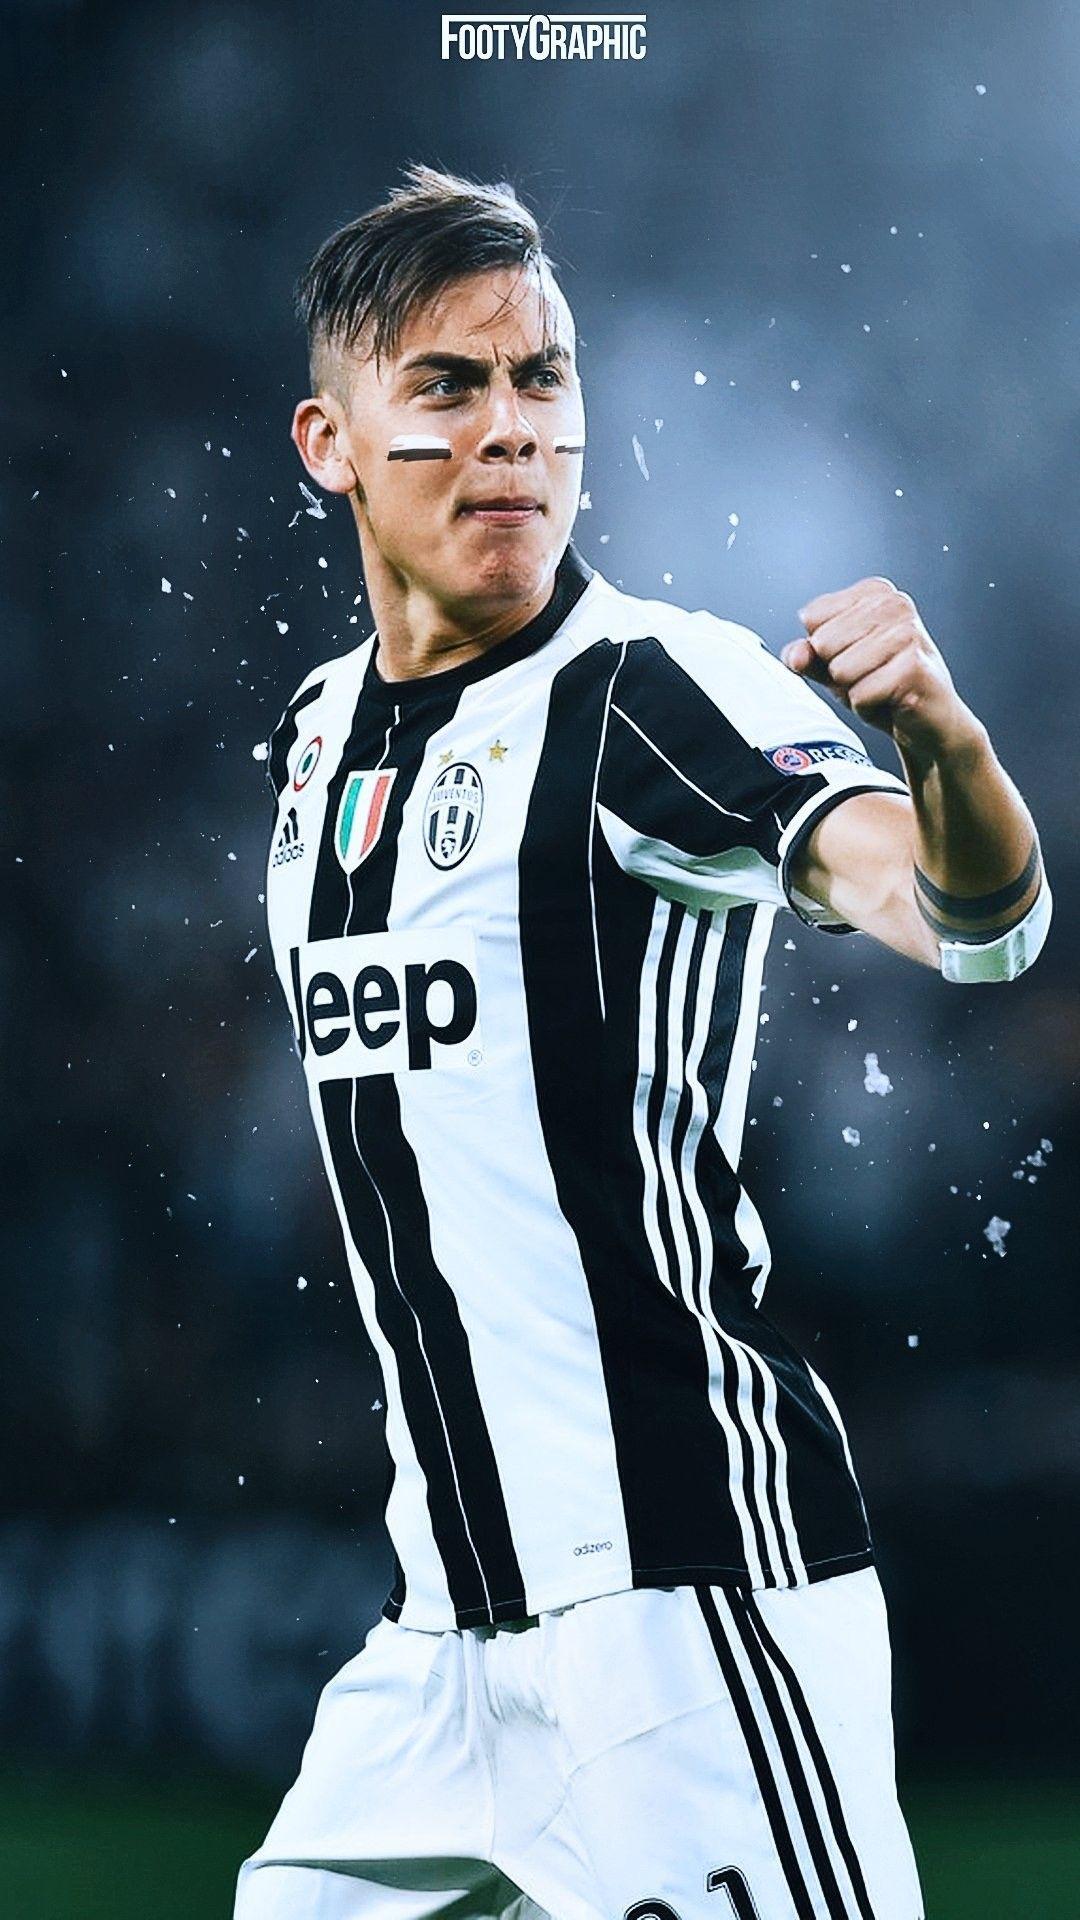 Champions League Real Madrid Wallpaper Android Download In 2020 Ronaldo Football Champions League Ronaldo Juventus